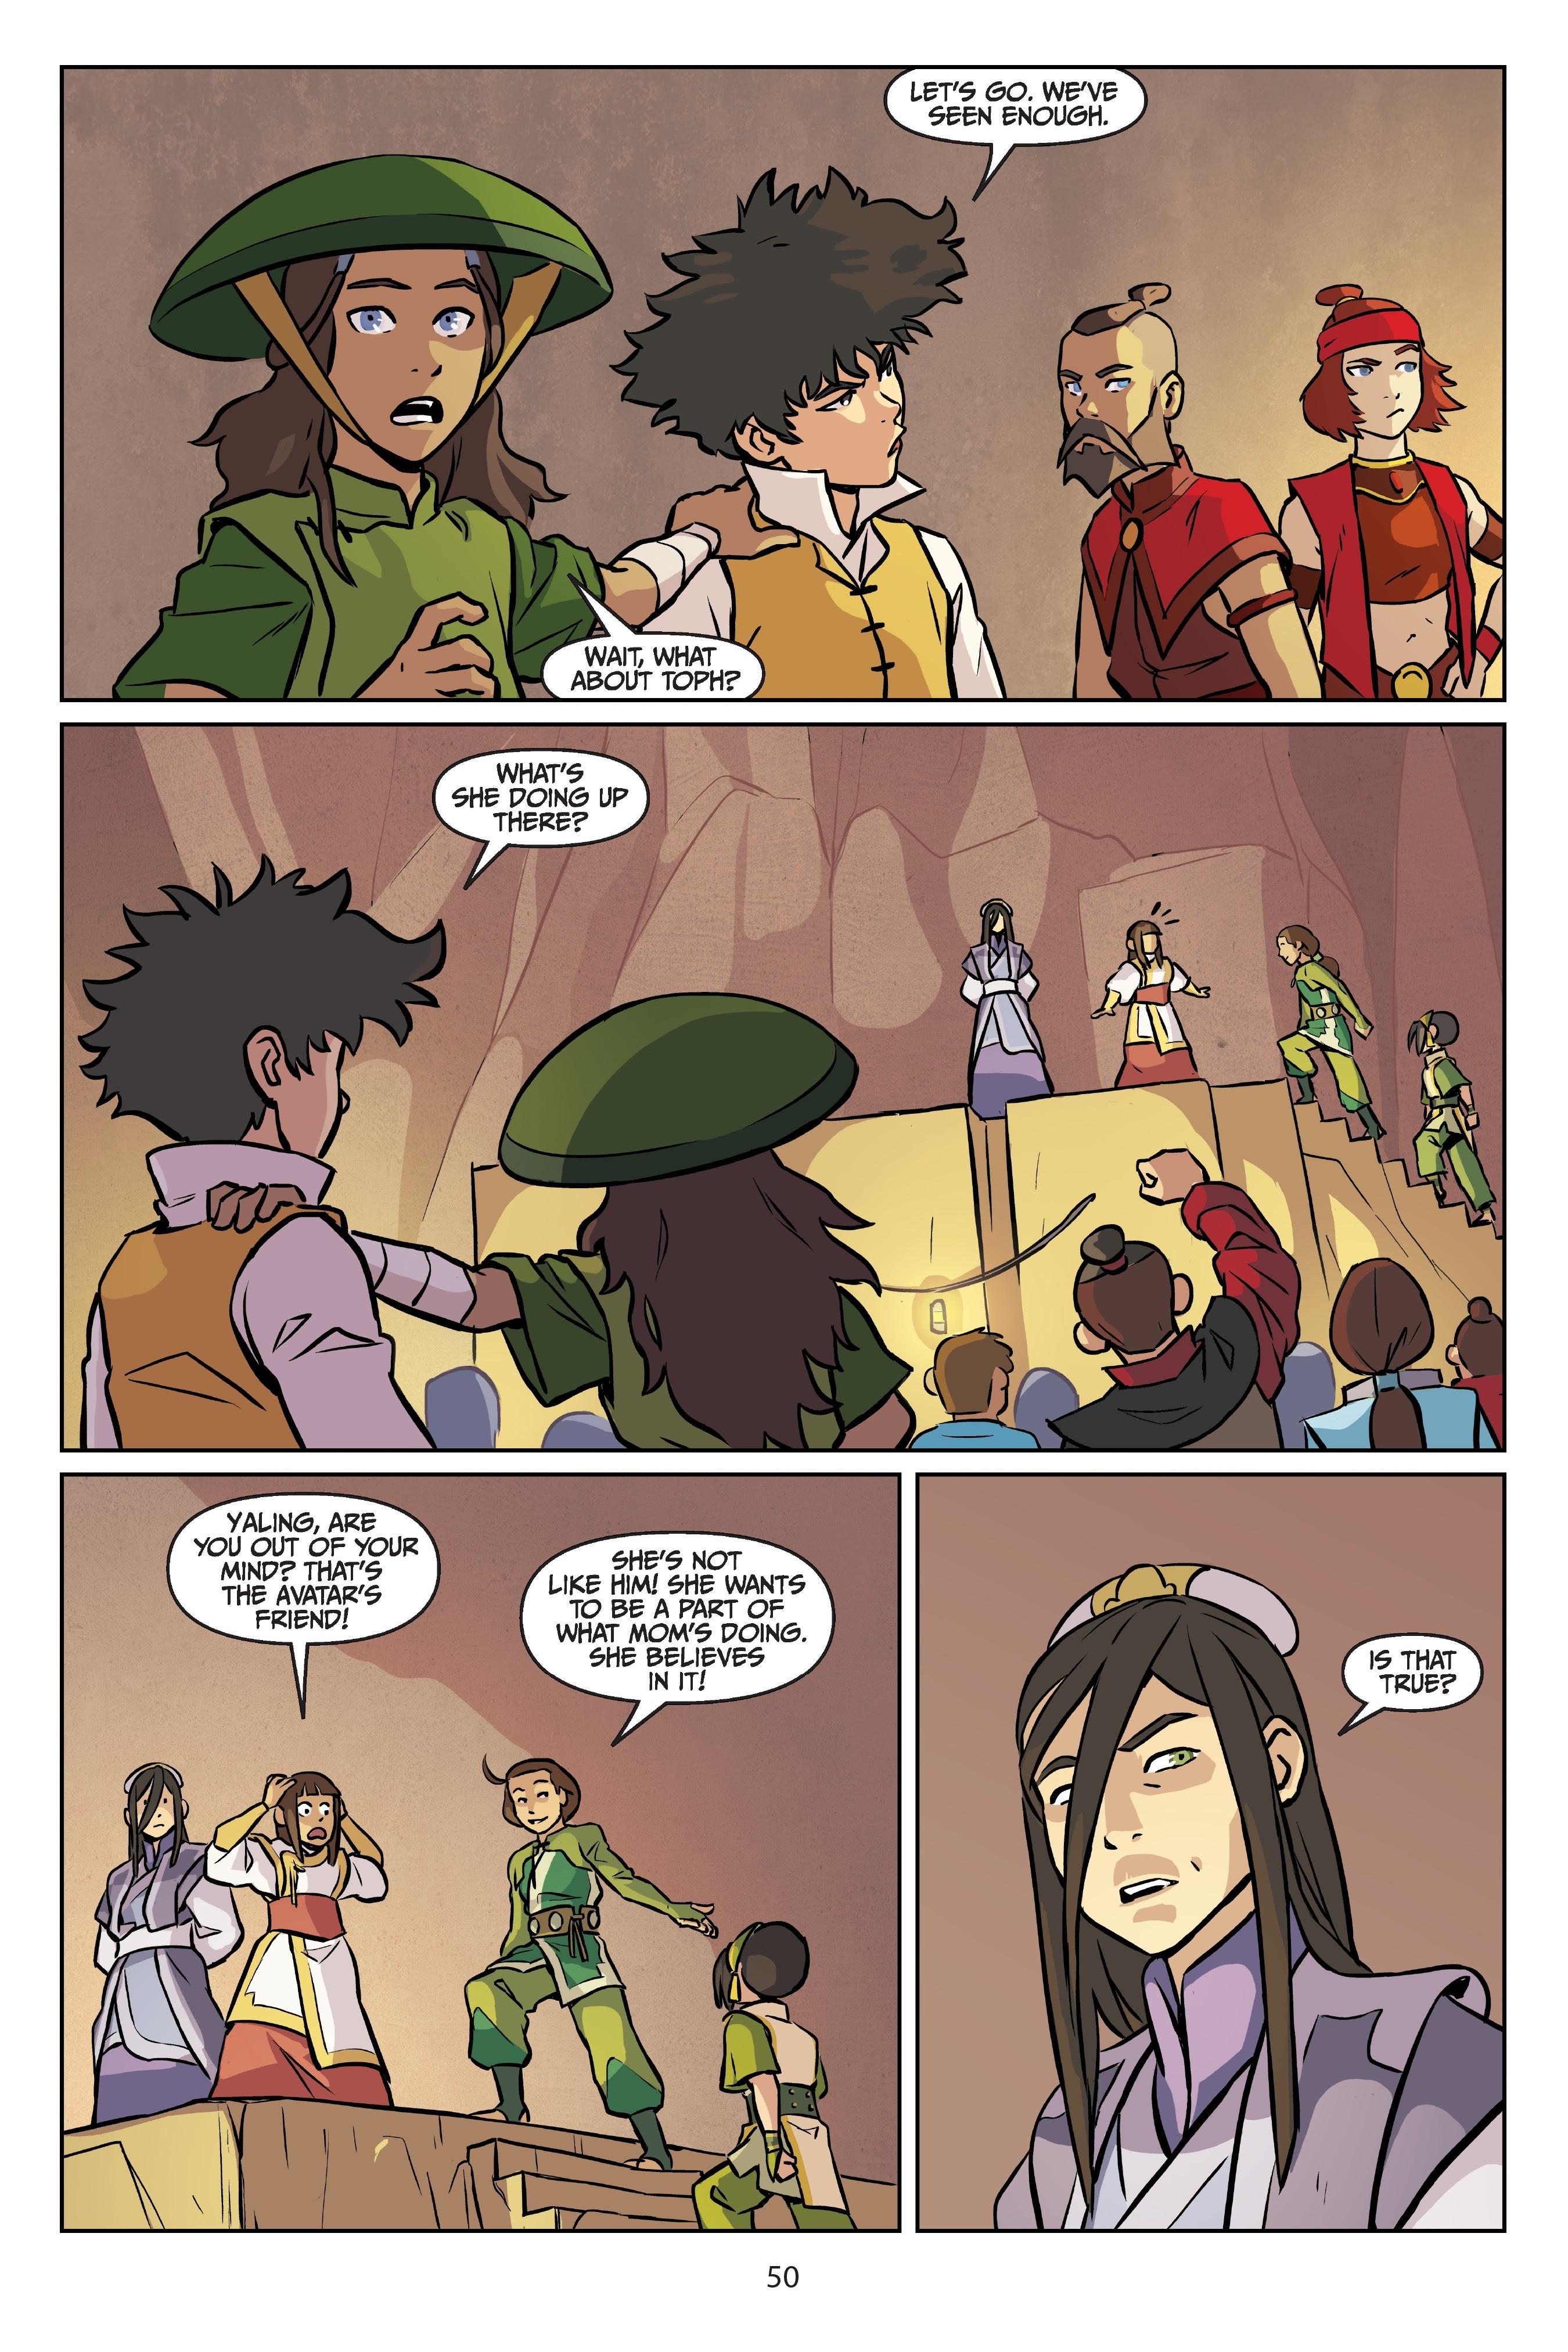 Nickelodeon Avatar: The Last Airbender - Imbalance TPB_2 Page 50